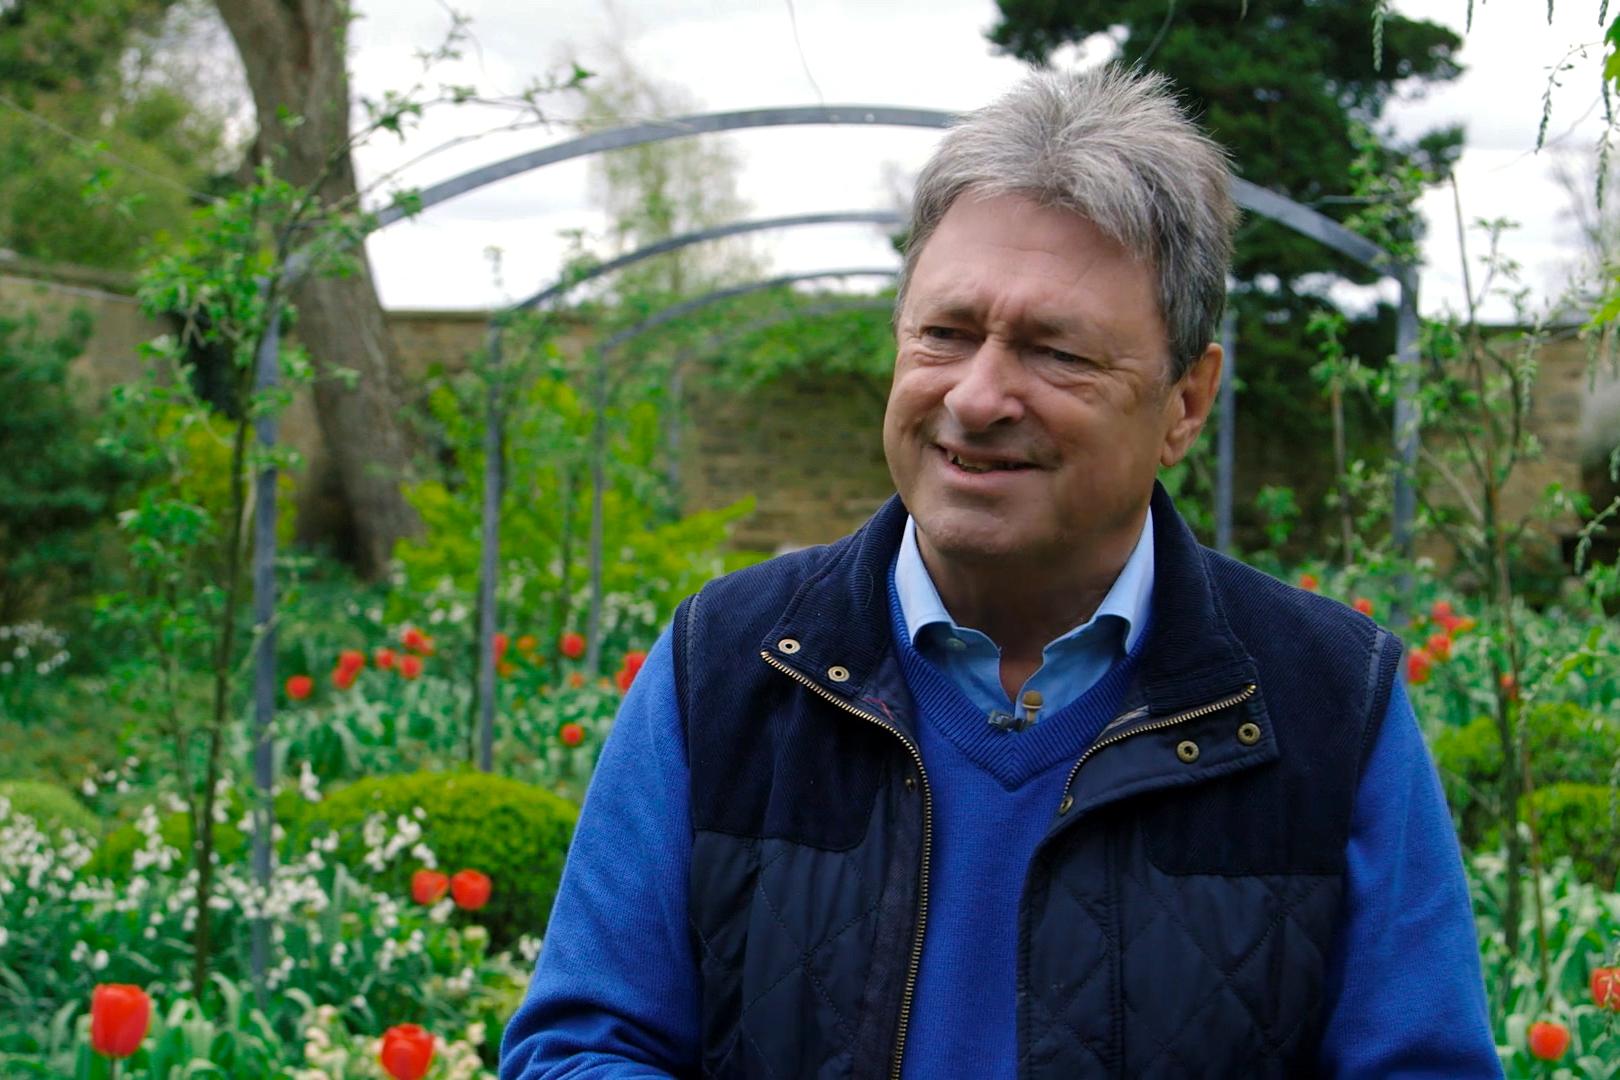 Alan Titchmarsh GW 50th Anniversary memories video